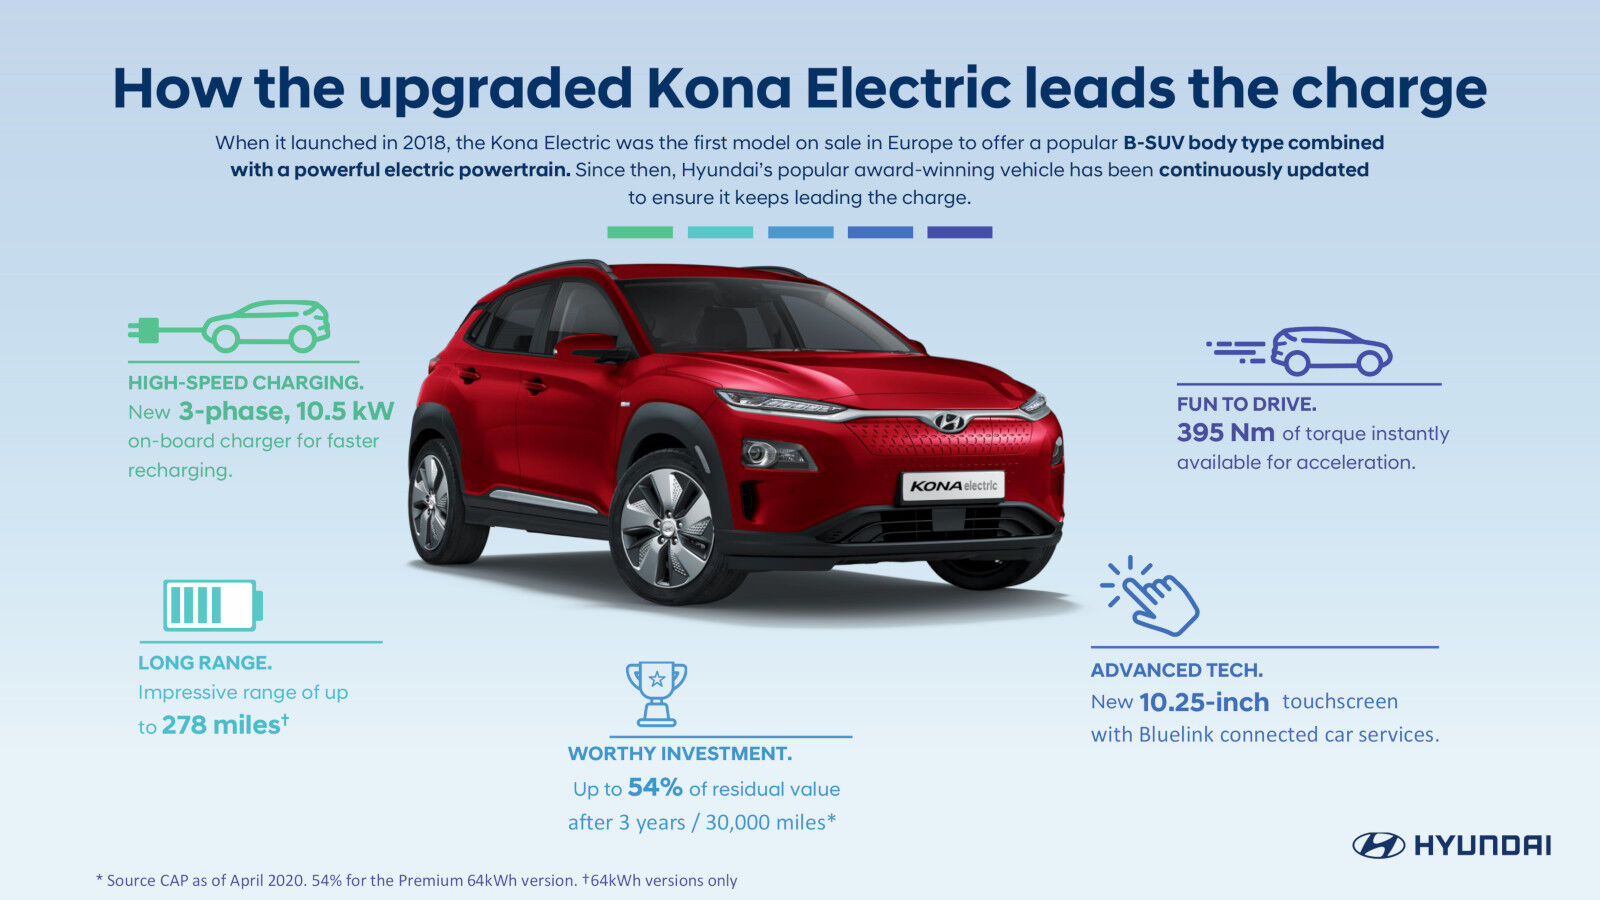 Hyundai Kona electric range residual value charging and technology